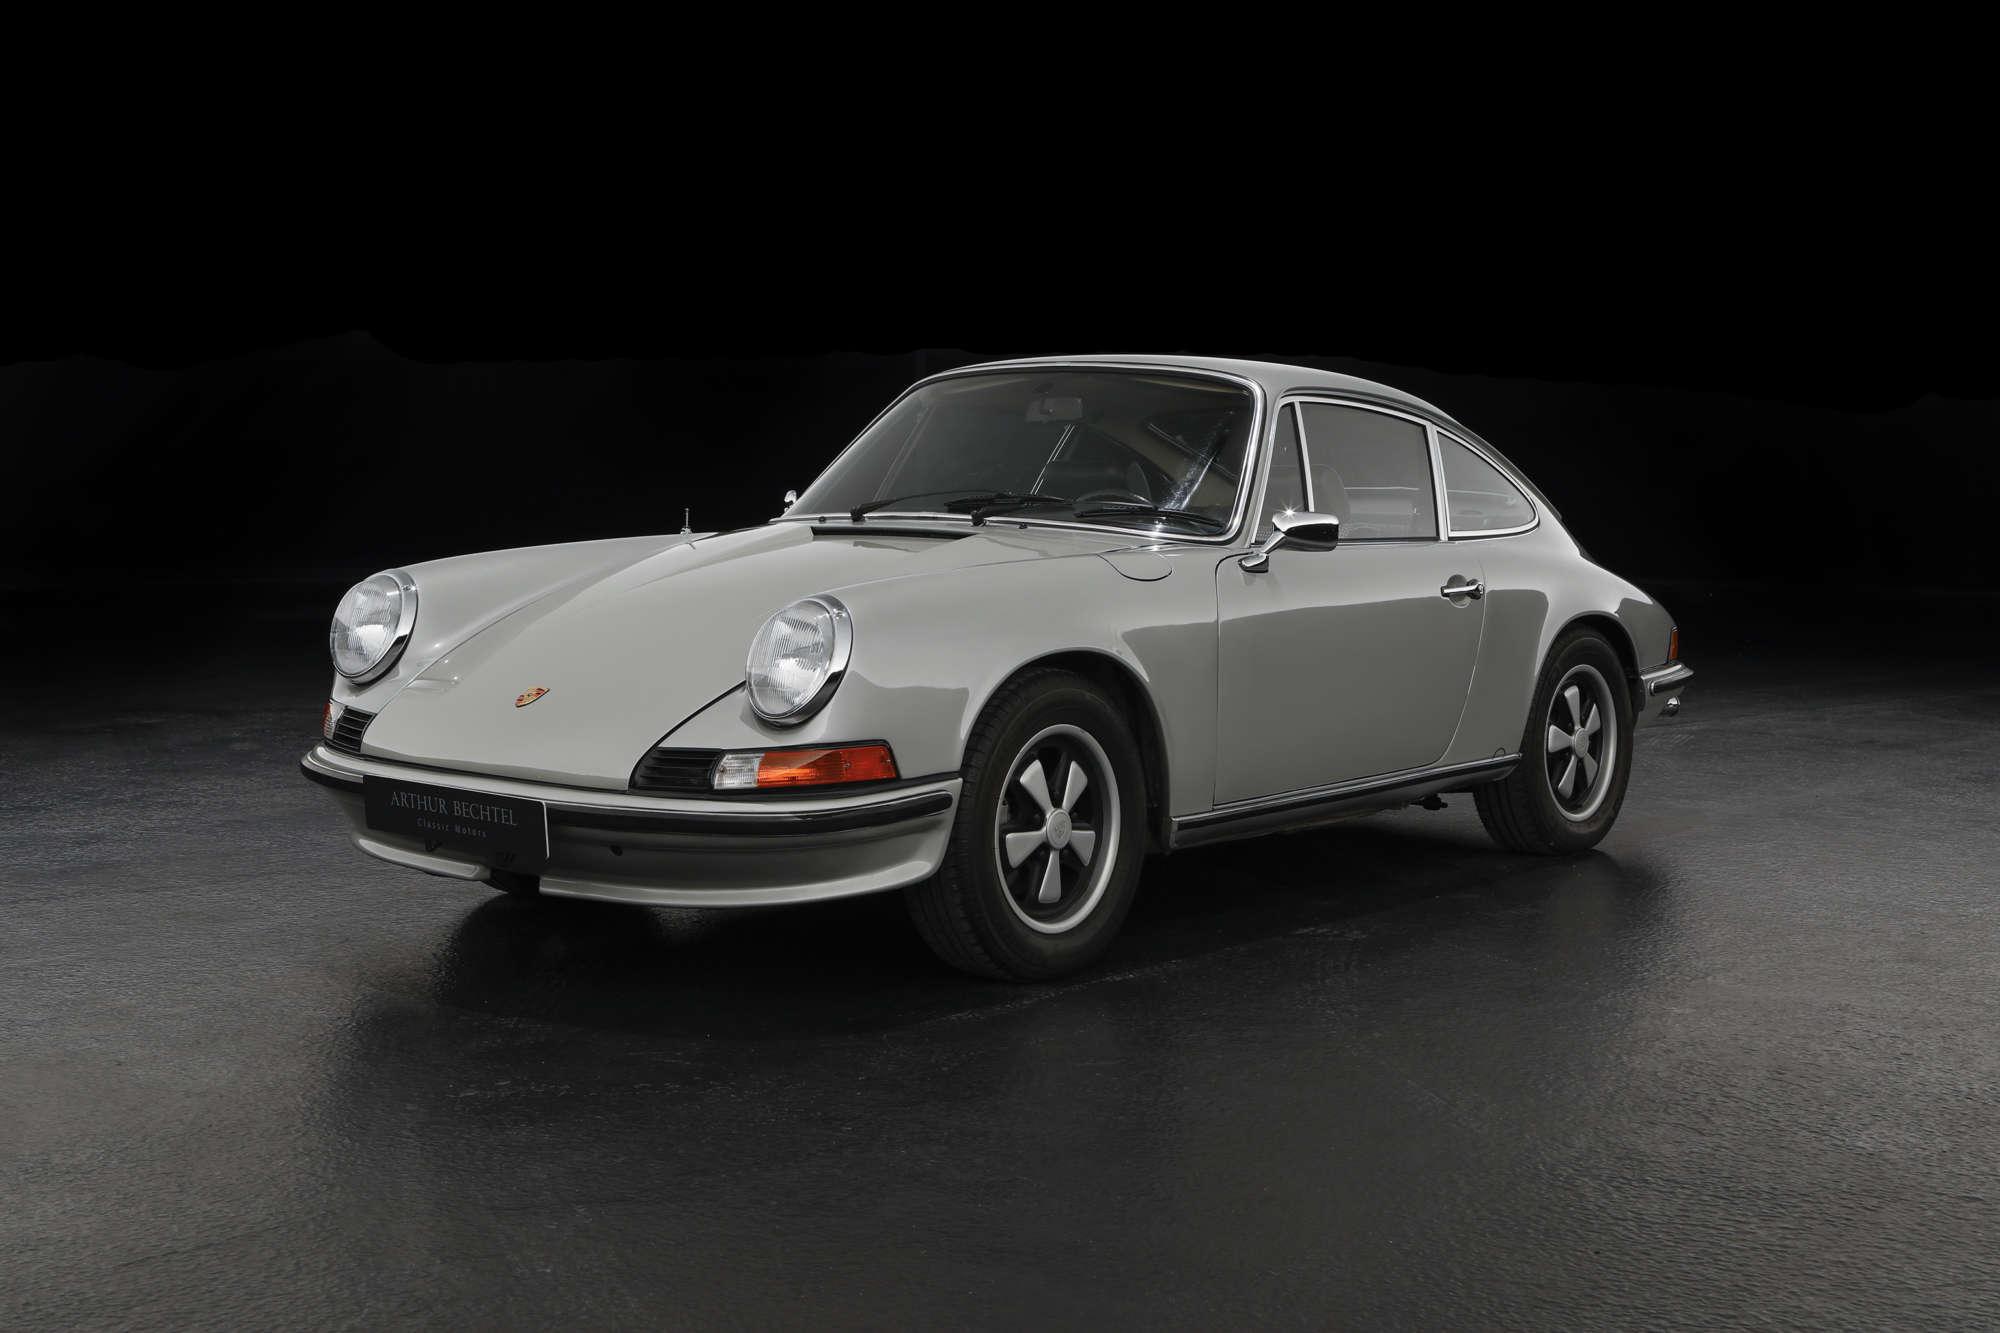 Porsche 911 S for sale